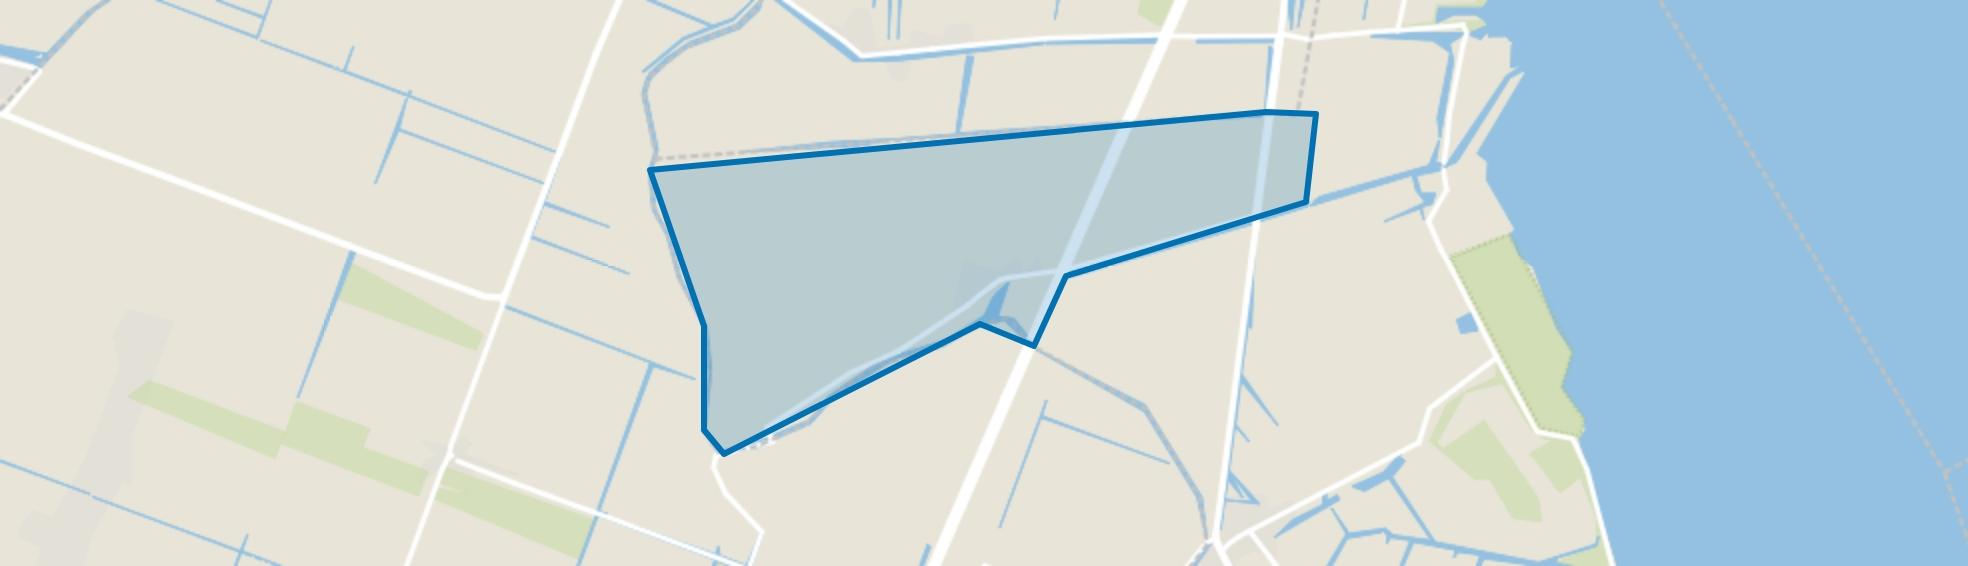 Beets, Beets map